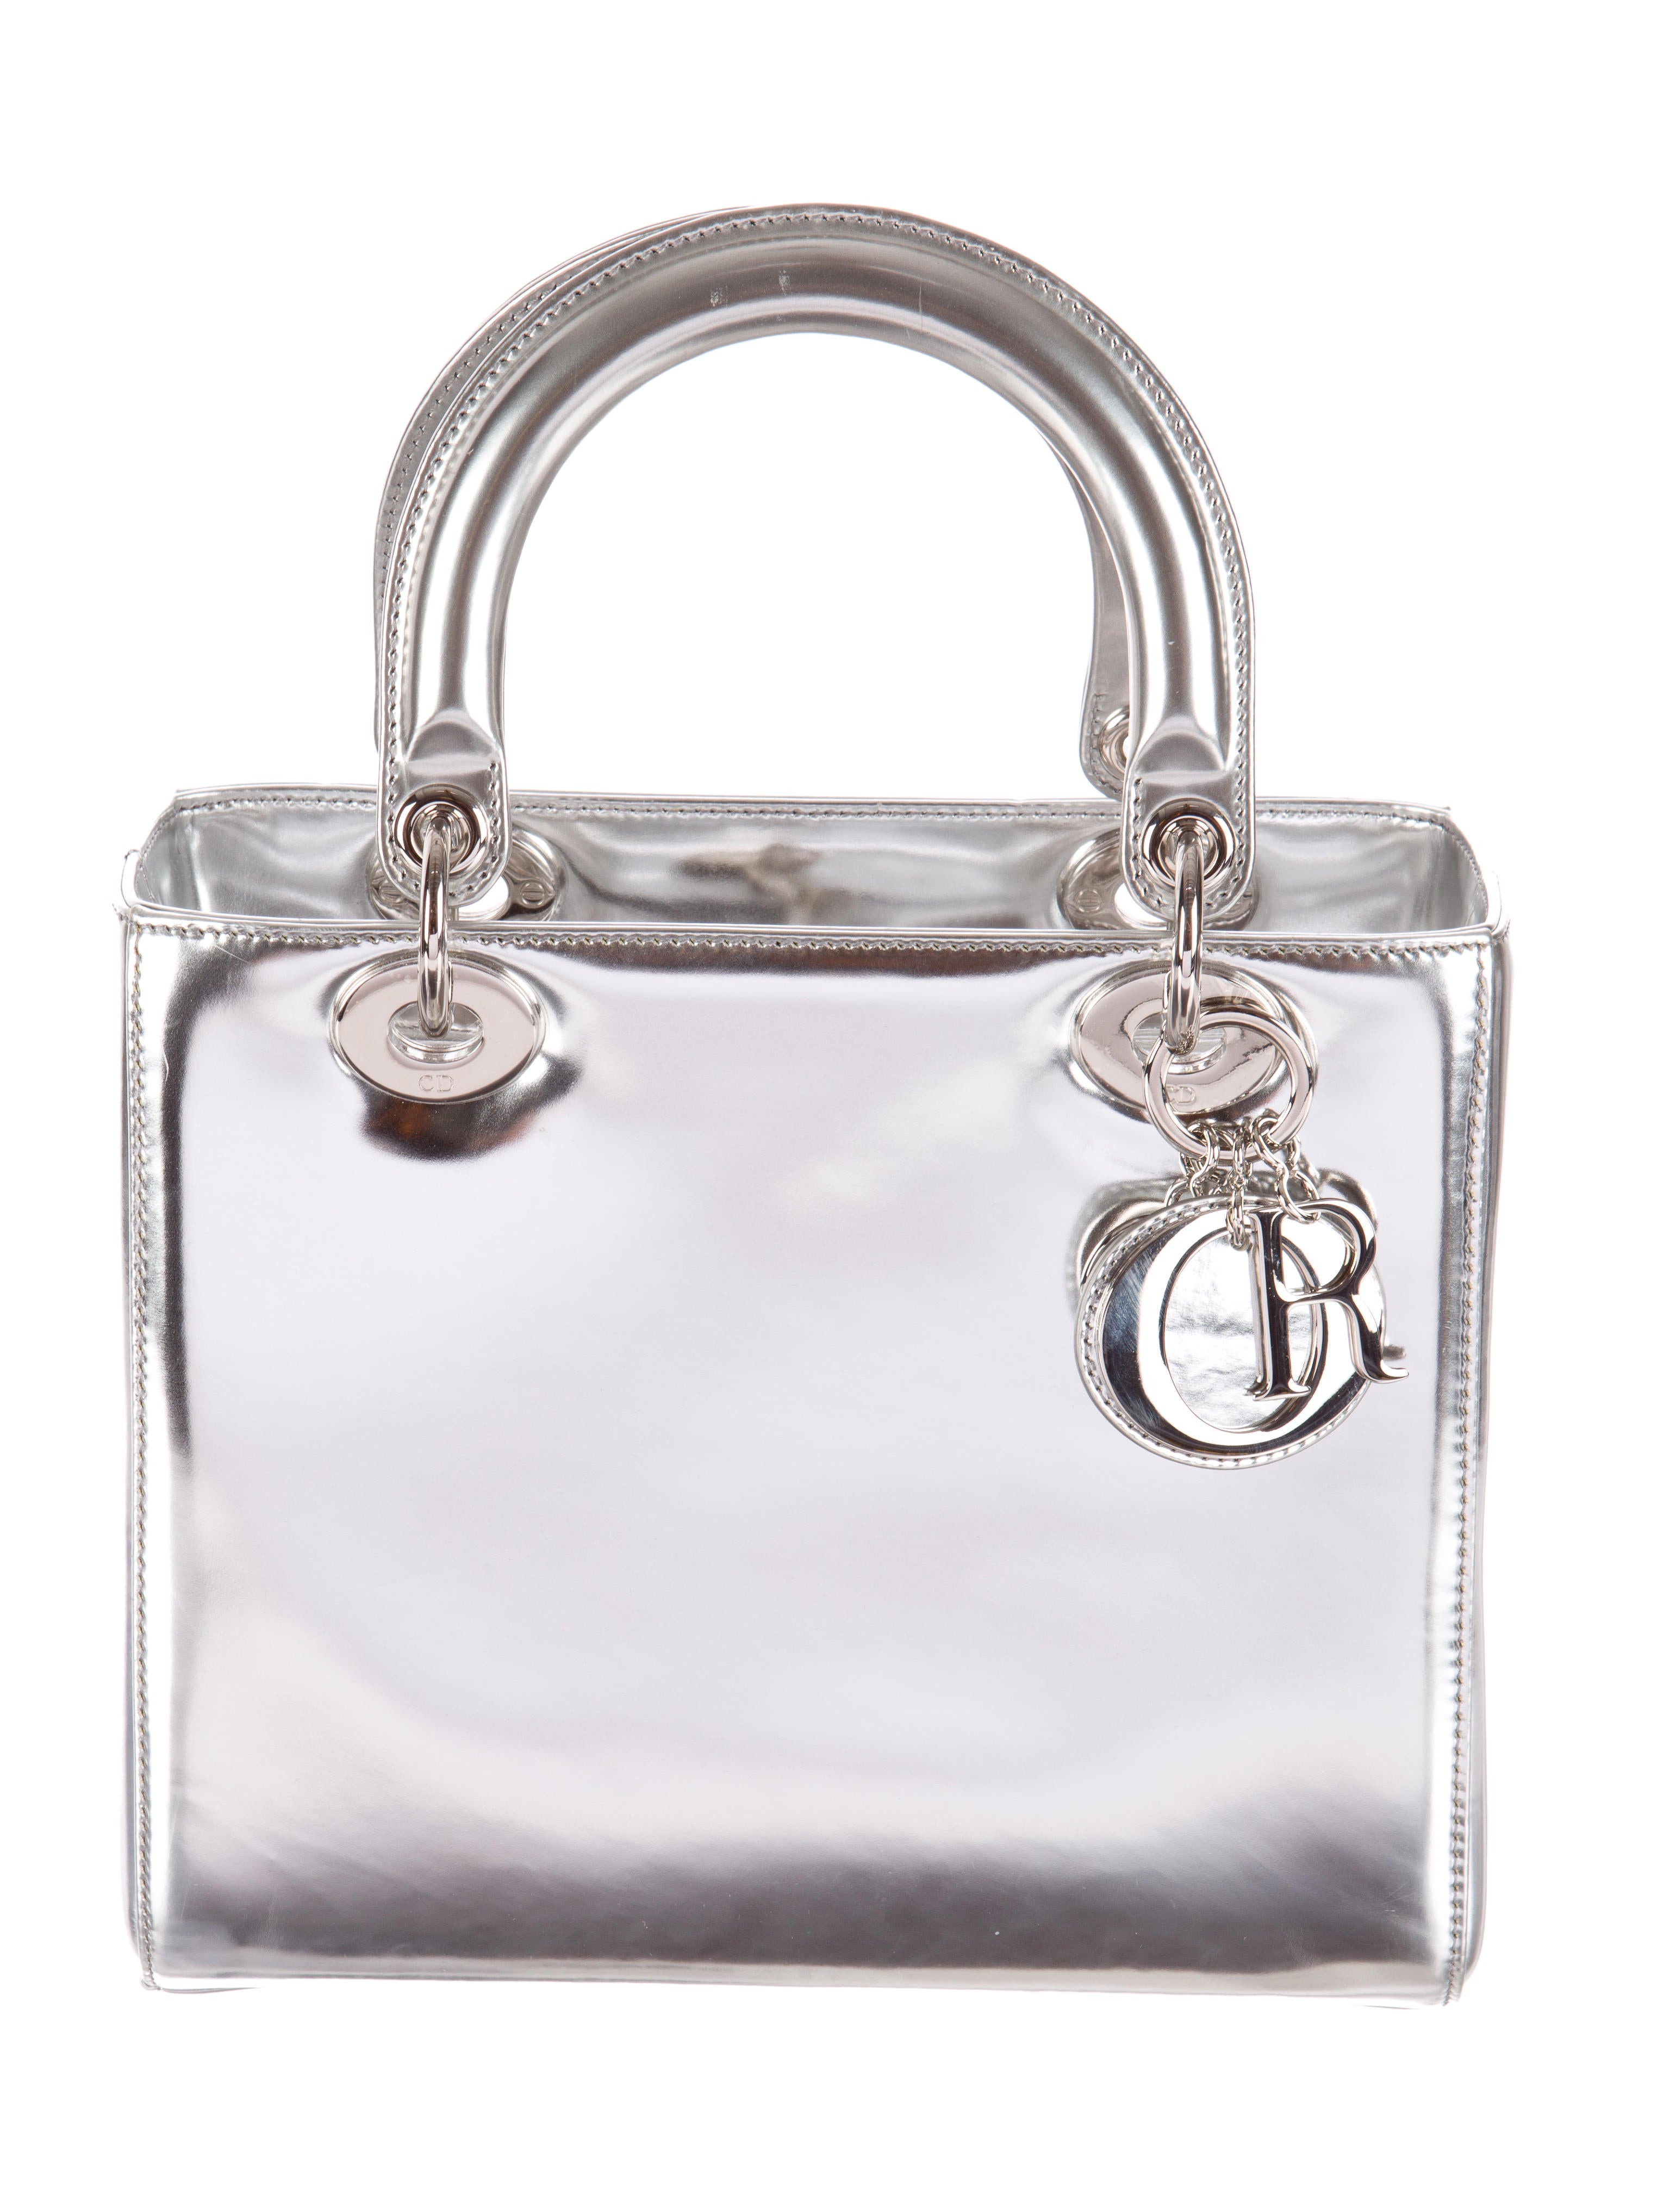 Christian Dior Metallic Medium Lady Dior Bag - Handbags ...